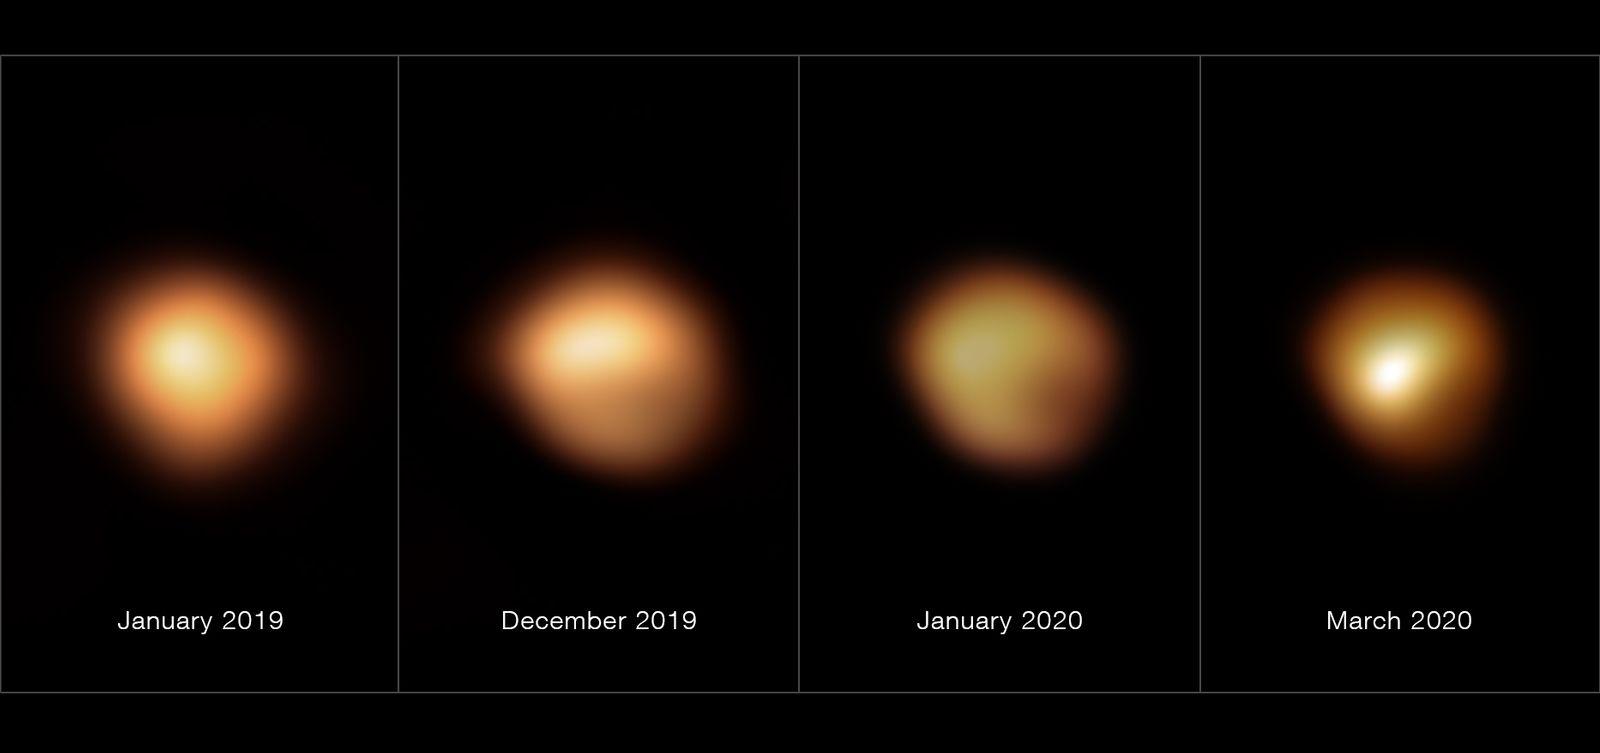 Dossier: Rätsel der «großen Verdunkelung» des Sterns Beteigeuze g